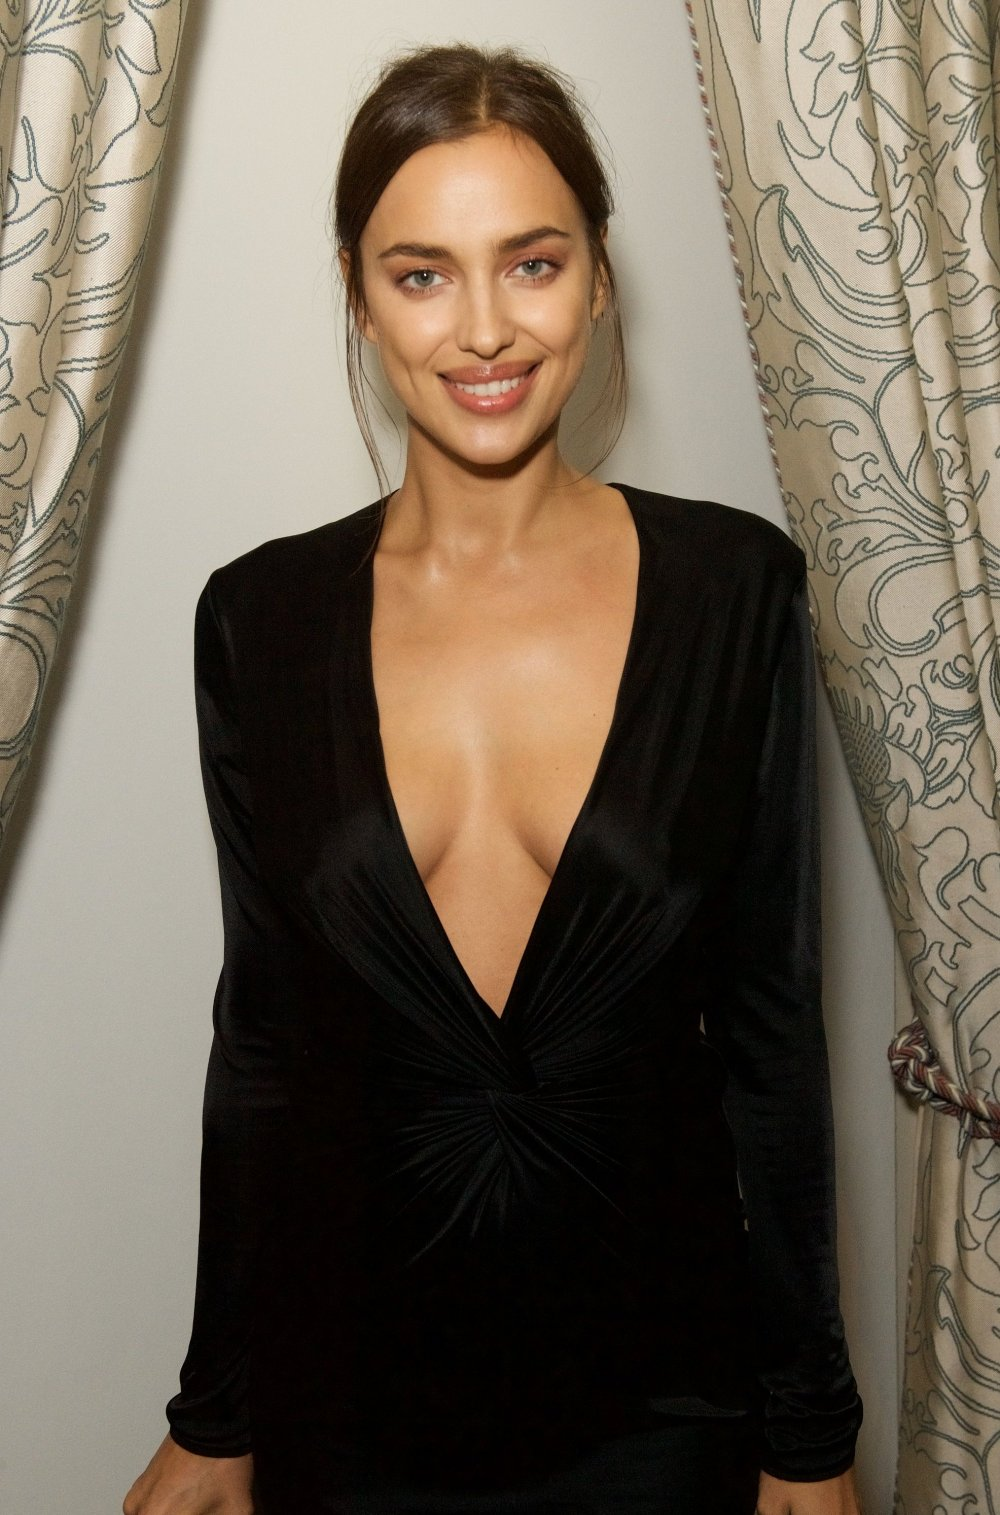 30-летняя Ирина Шейк беременна?